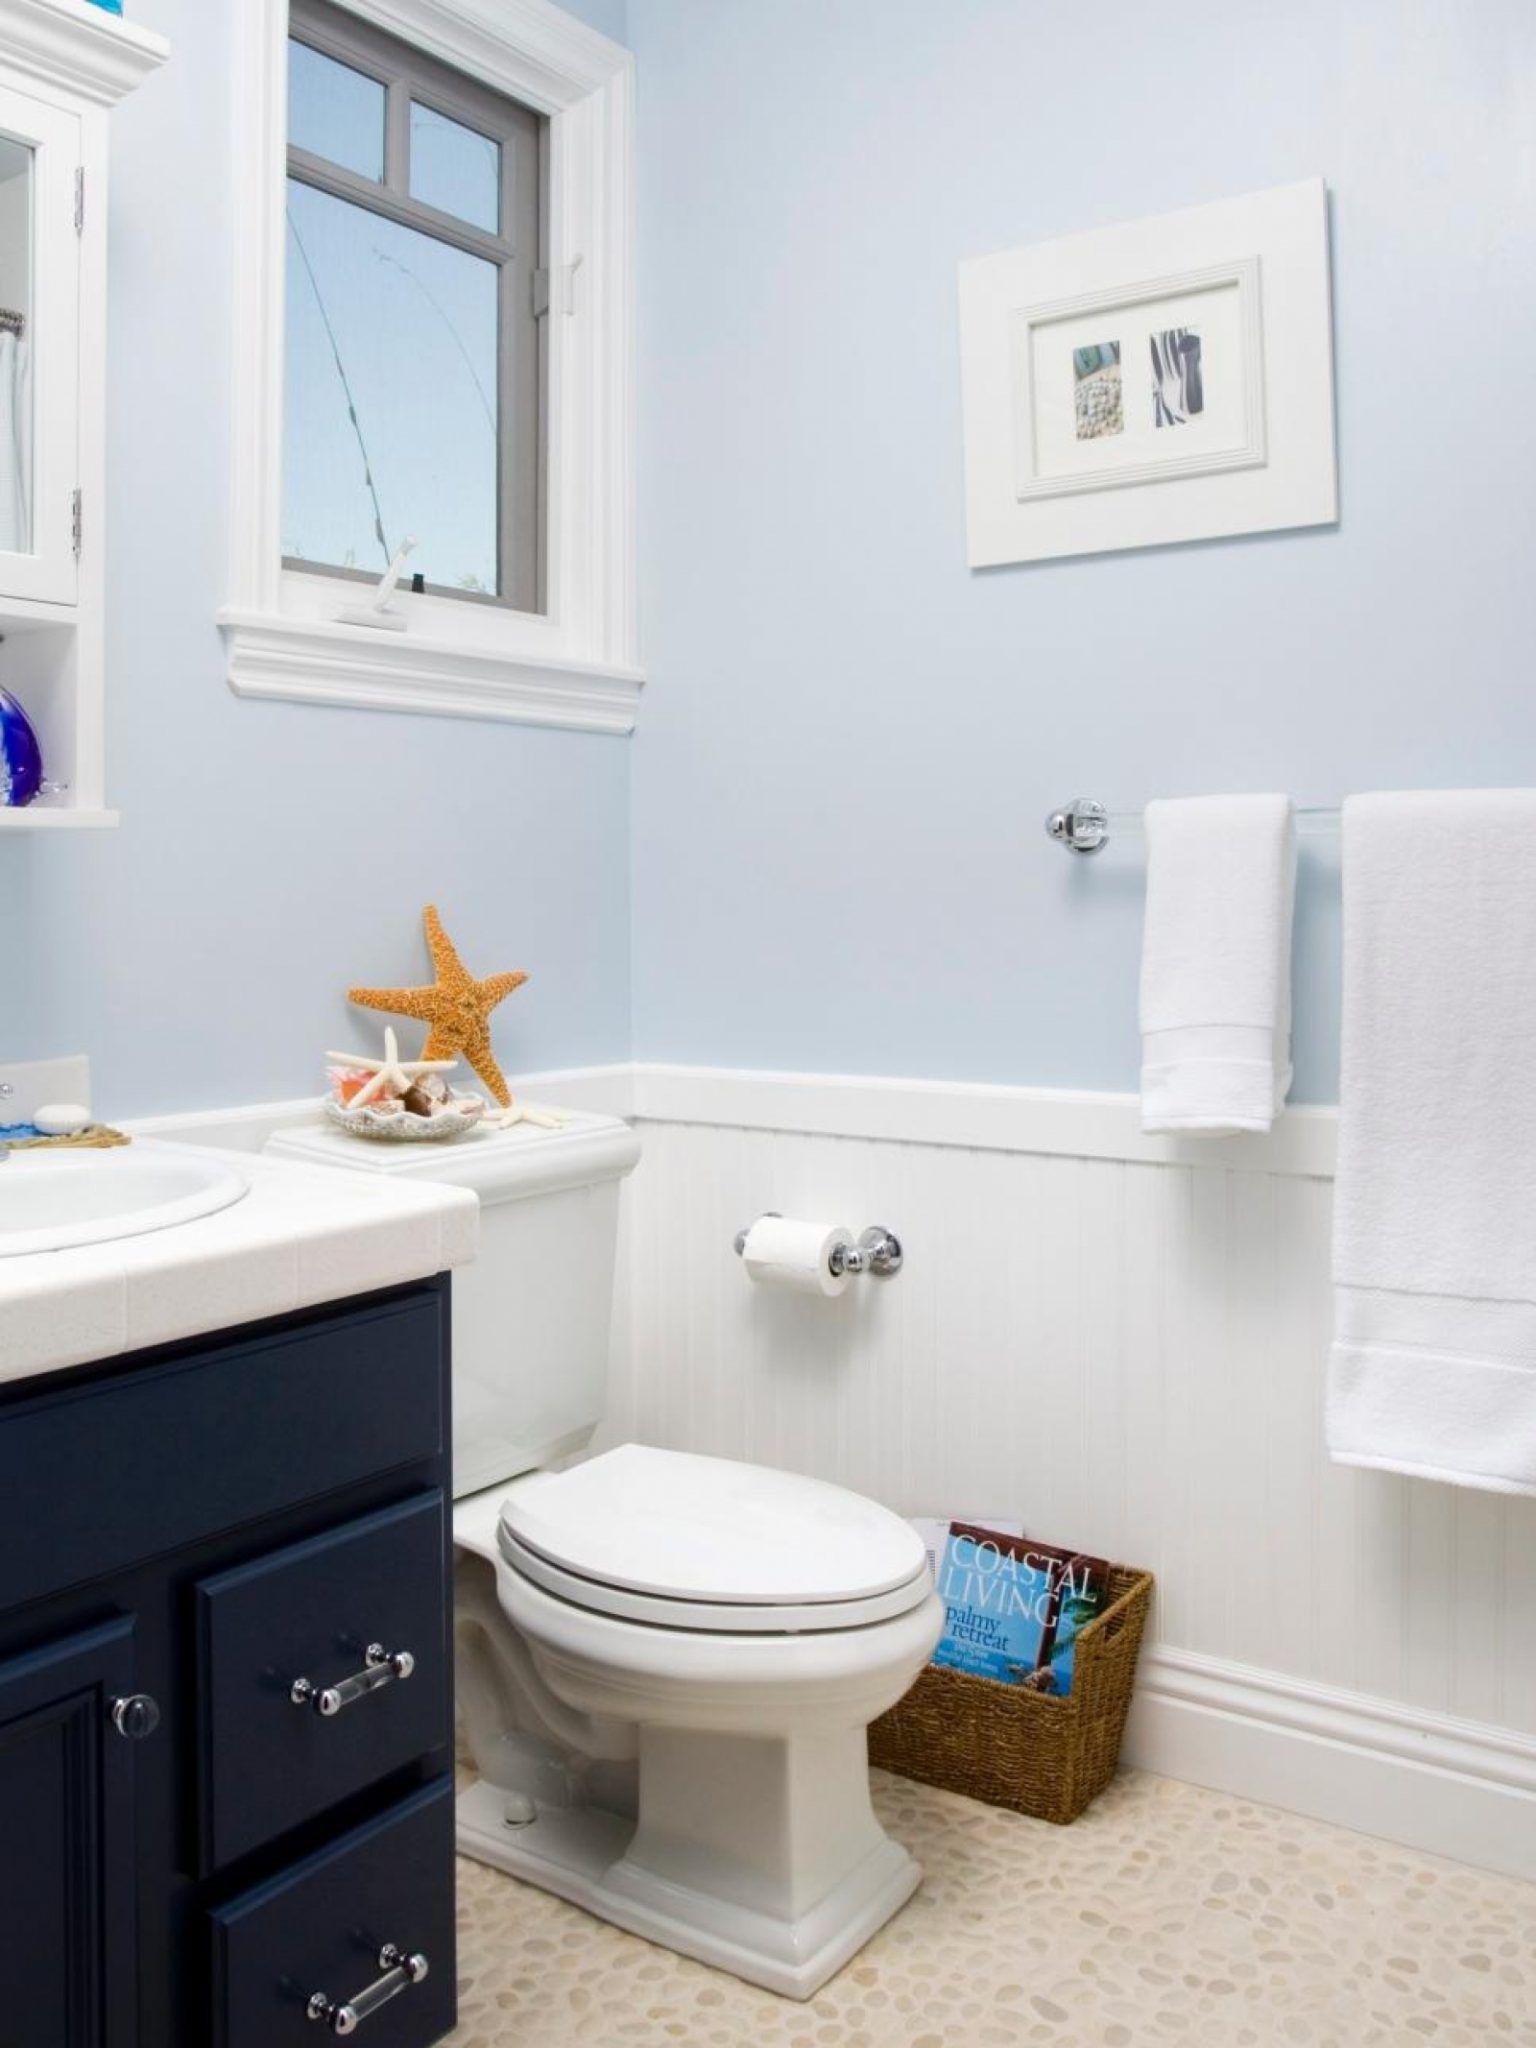 Badezimmer Umbau Ideen Fur Kleines Bad Bad Styling Badezimmer